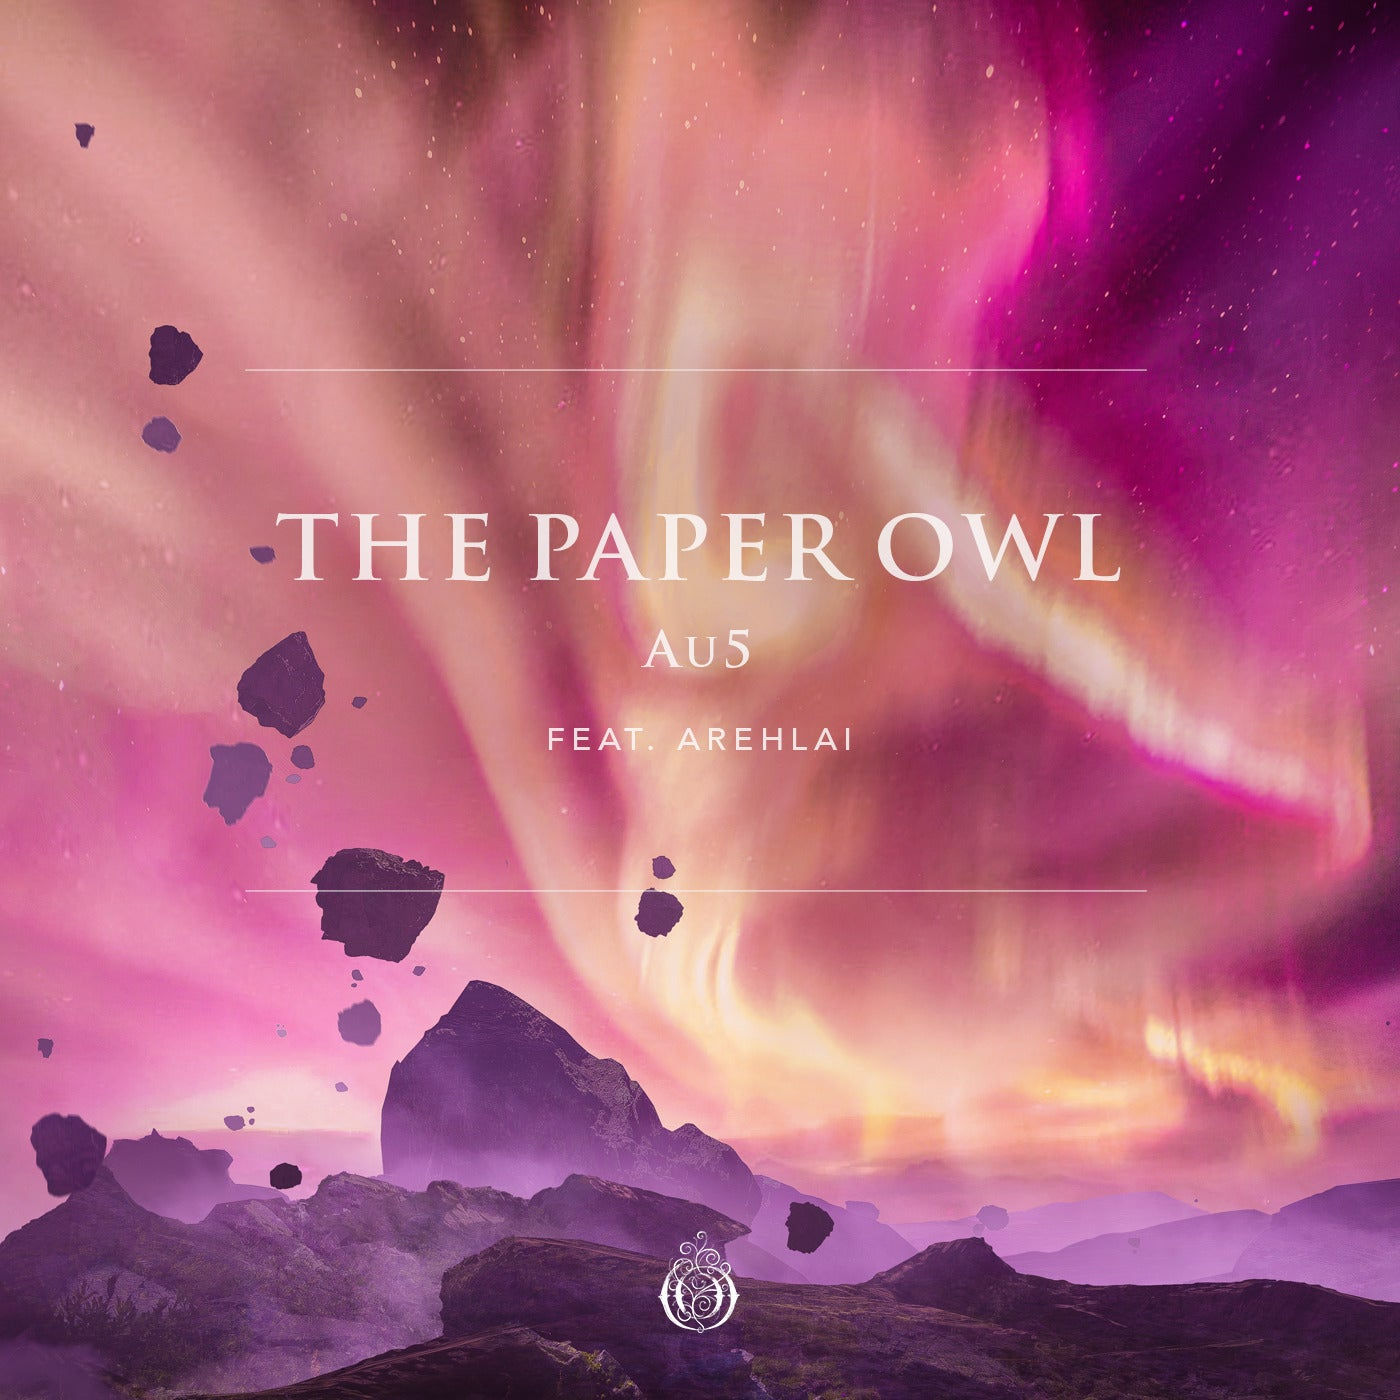 The Paper Owl (feat. Arehlai) feat. Arehlai (Original Mix)